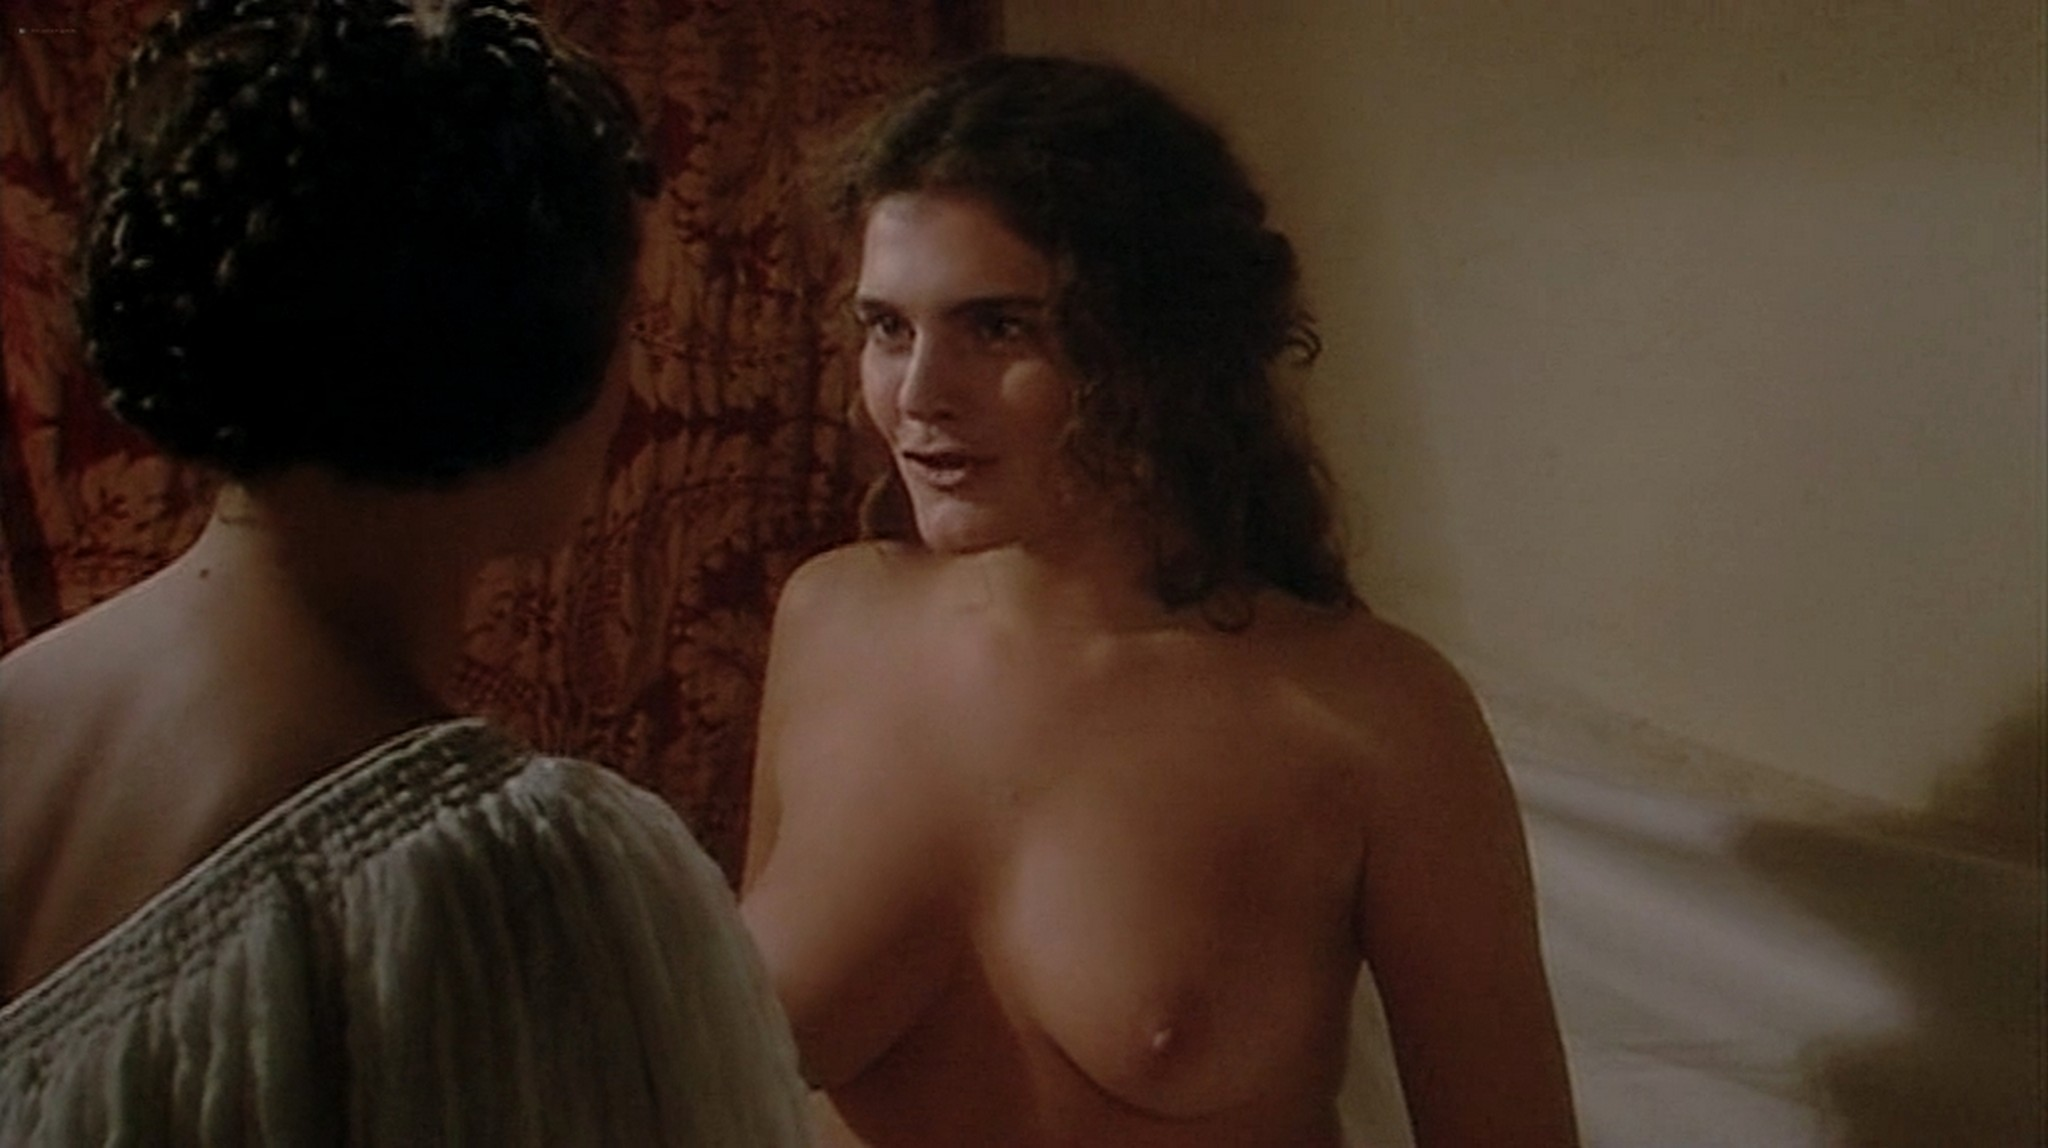 Laura Antonelli nude topless and sex Monica Guerritore nude topless and Clelia Rondinella nude lesbian sex La Venexiana 1986 DVDRip 4